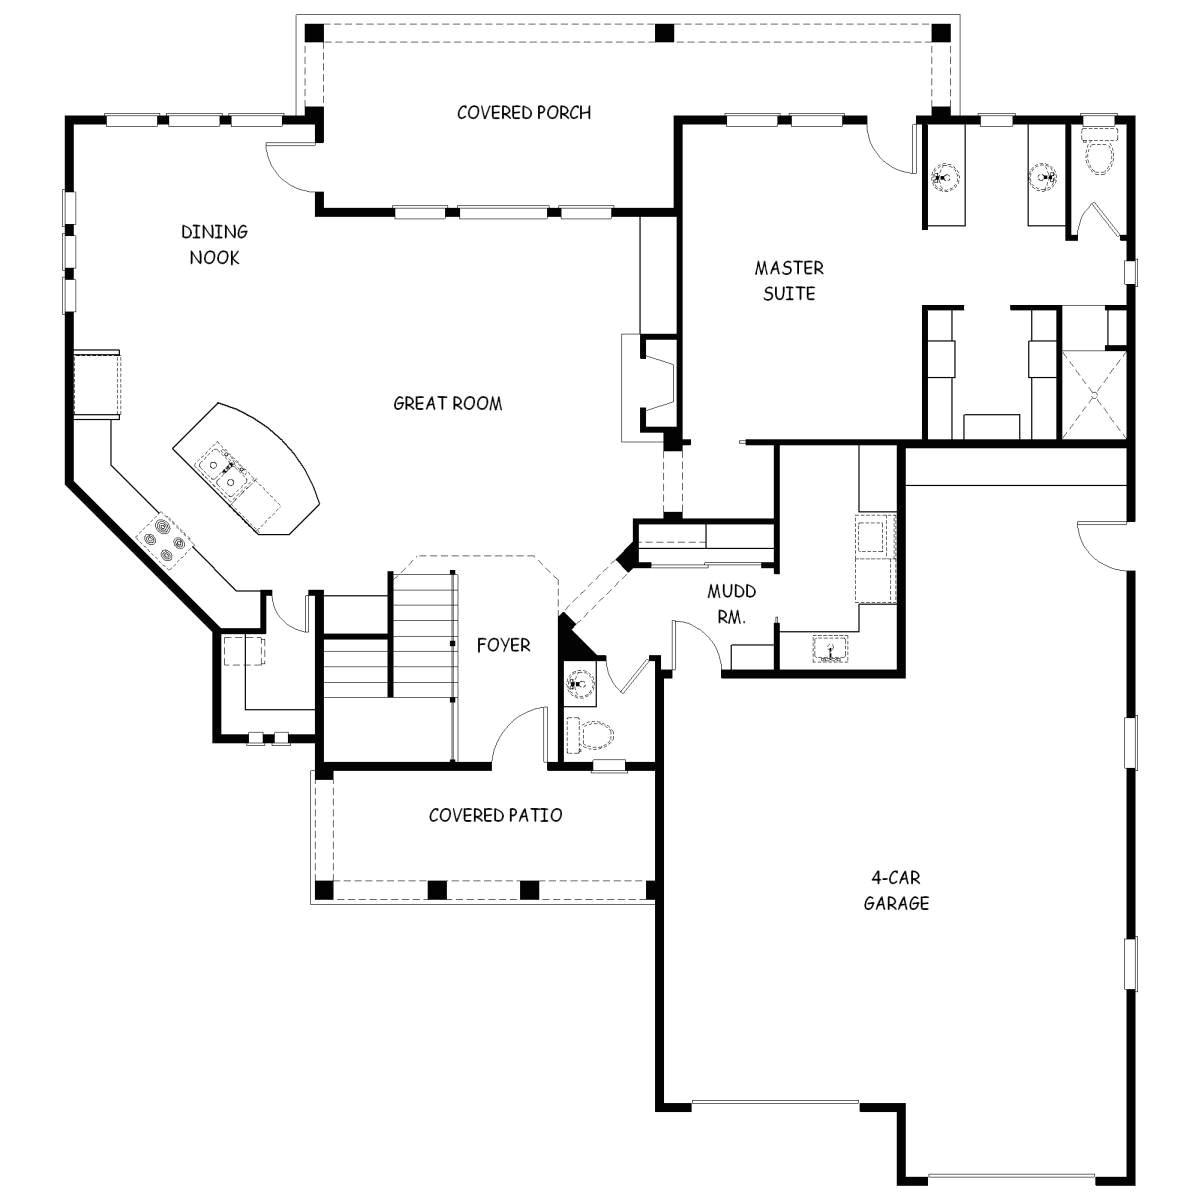 Idaho Home Plans Tahoe Homes Boise Floor Plans Lovely Fmci Homes A Boise